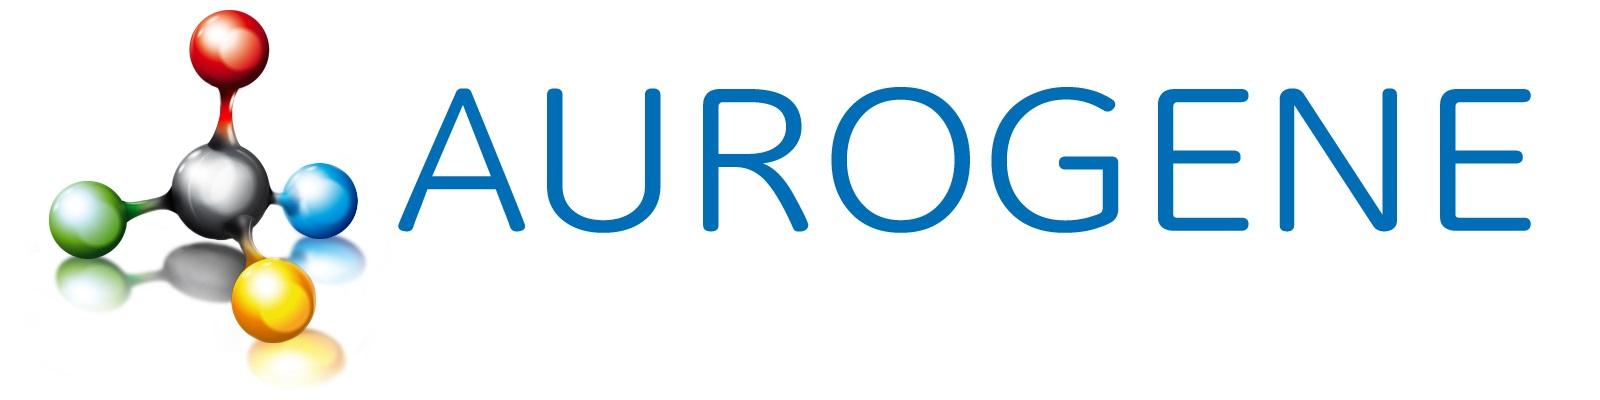 logo-aurogene-web-hd.jpg